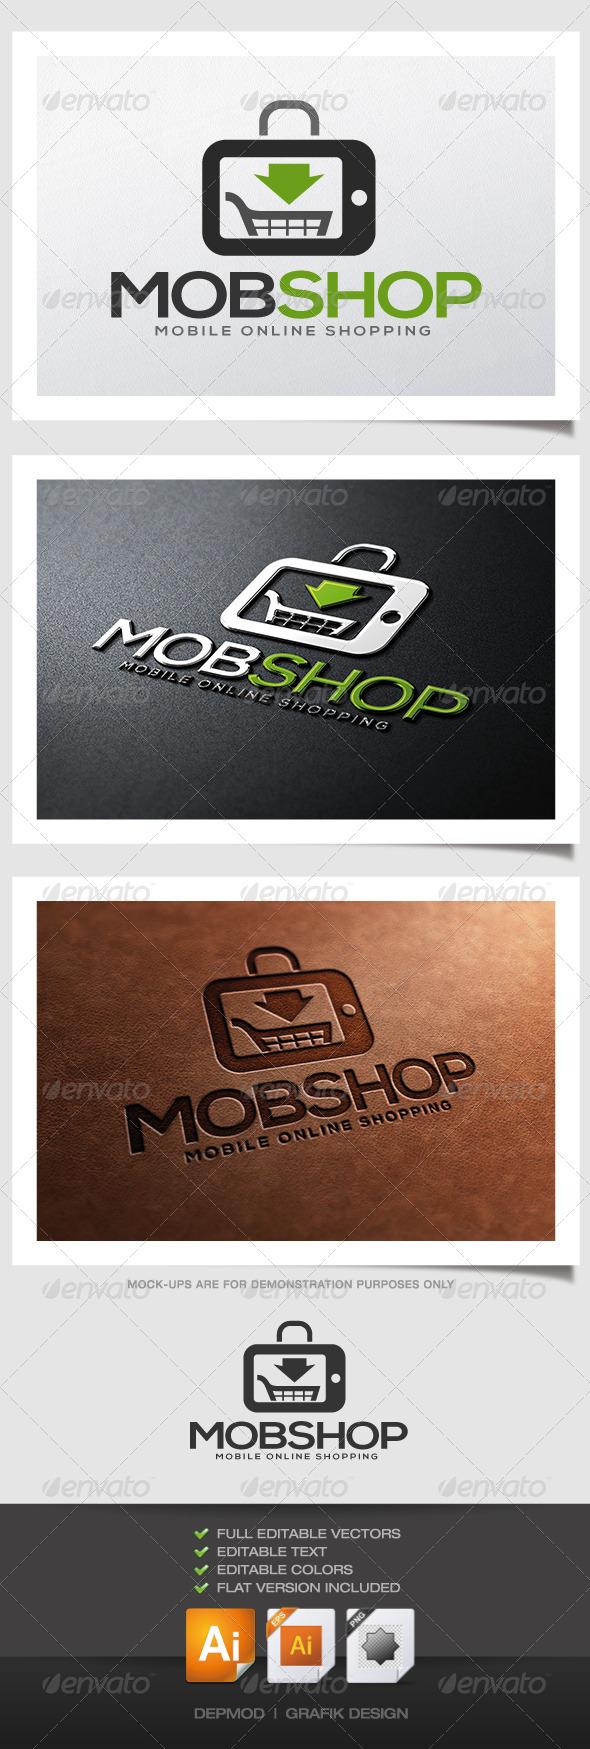 GraphicRiver Mob Shop Logo 4562887